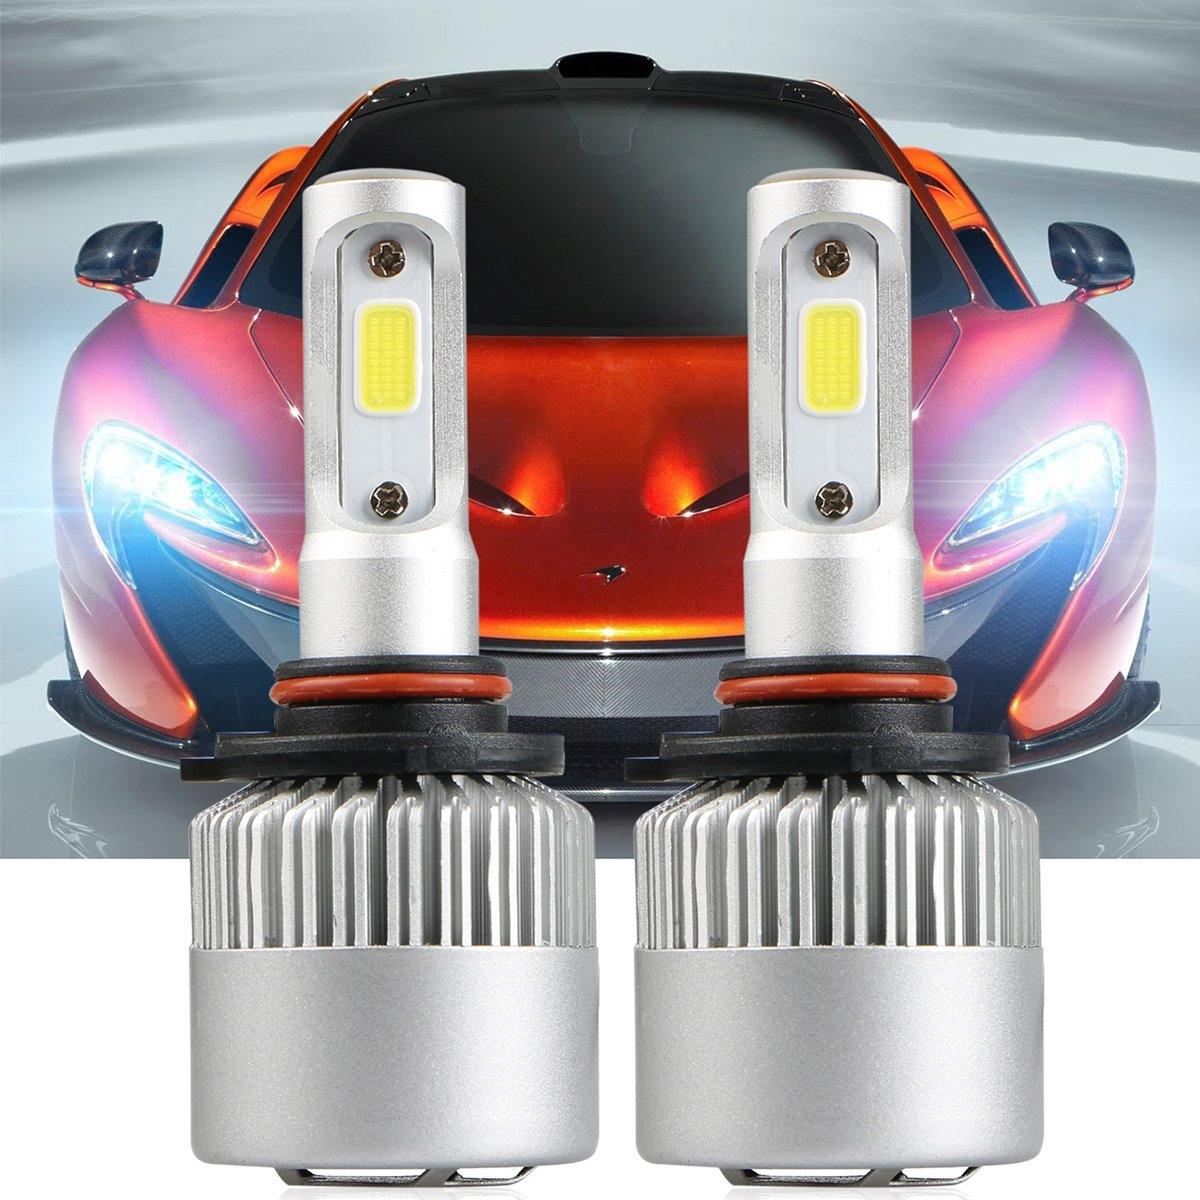 LinkStyle 2PCS LED Headlights 9005 HB3 Waterproof 36W 6500K 8000Lumens Super Bright Cool White COB Chips Fog Light Cree Bulb High Low Beam All-in-One Conversion Kit 9005 LED Headlight Bulbs 9005